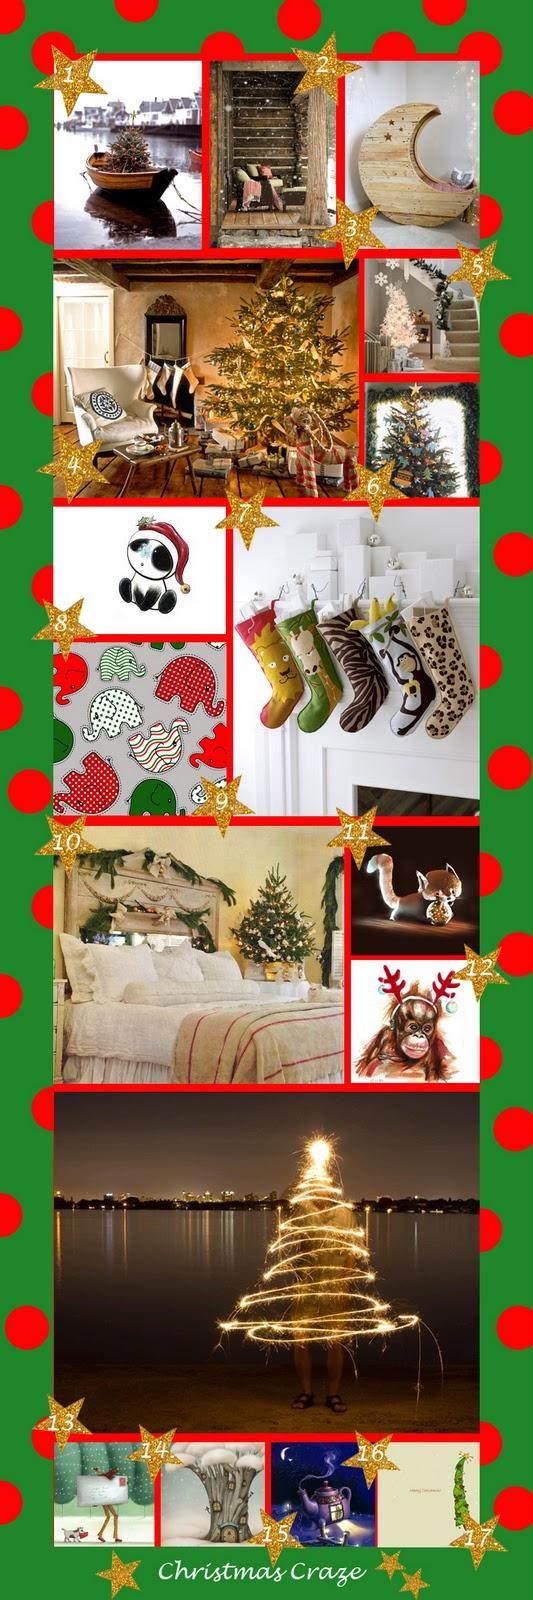 ChristmasCraze_flat.jpg